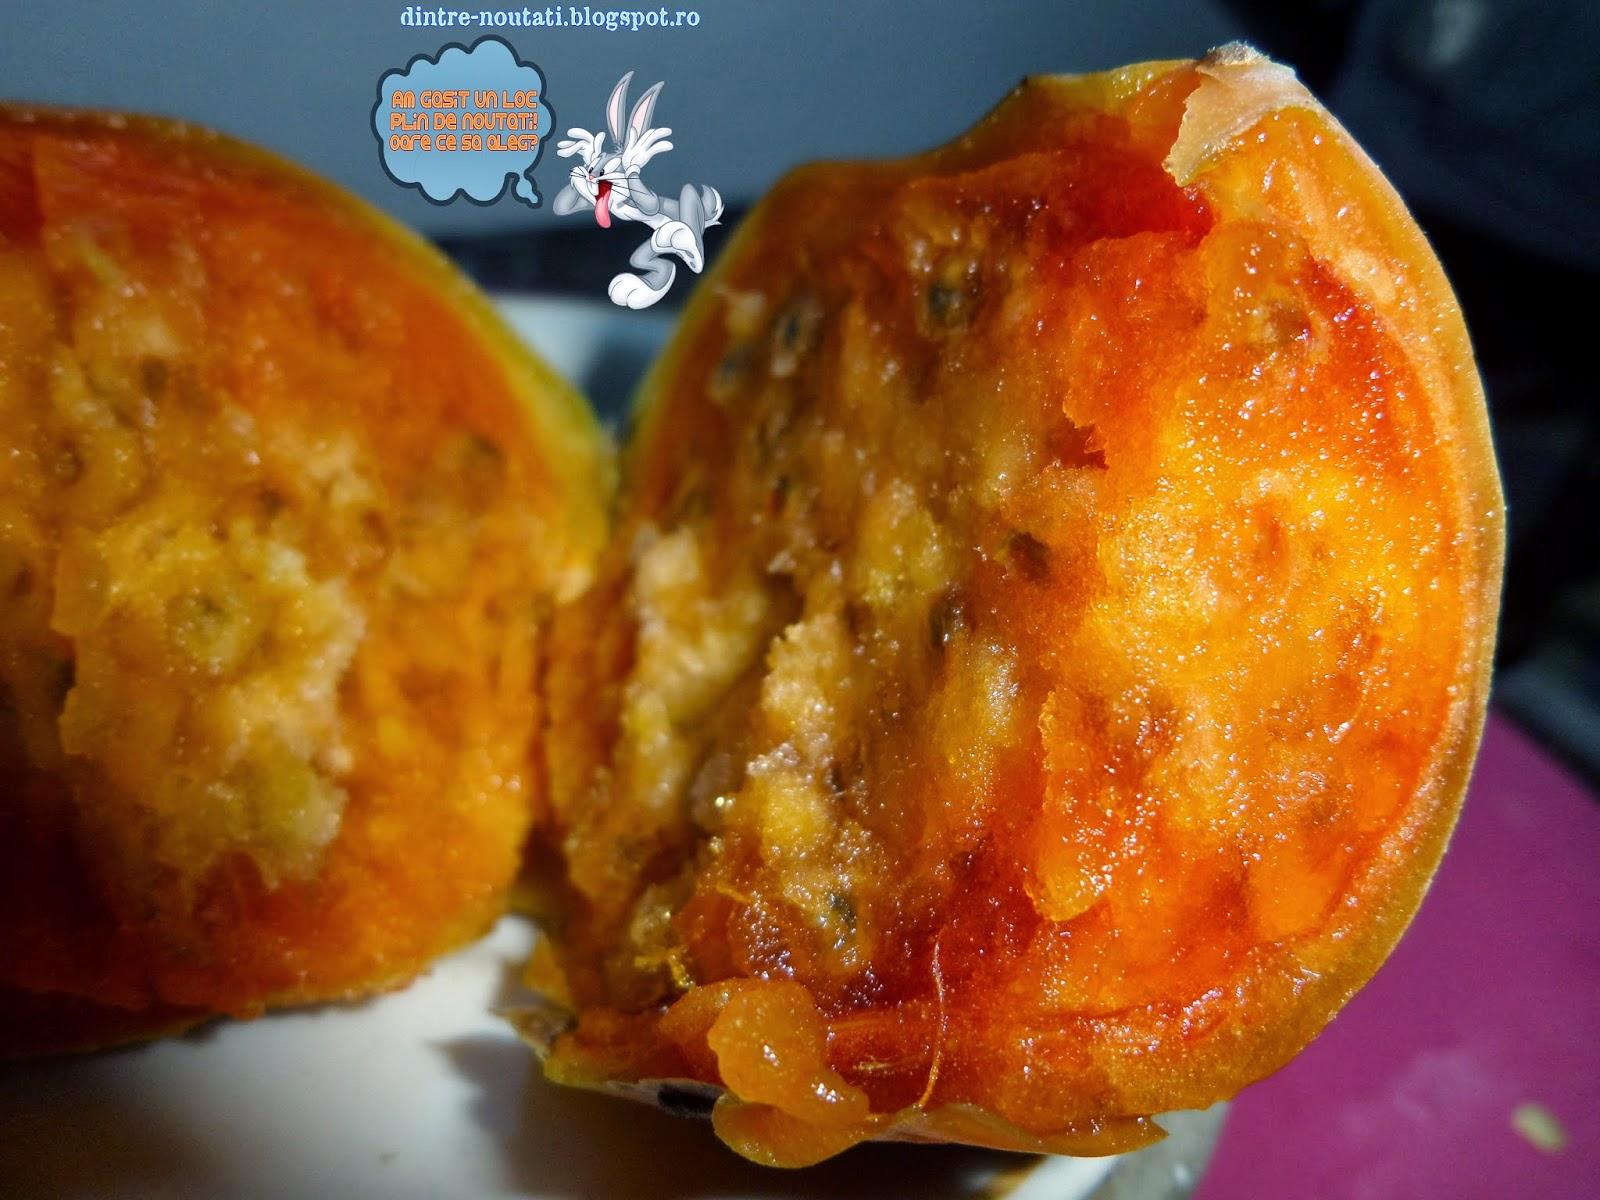 fructul galben portocaliu